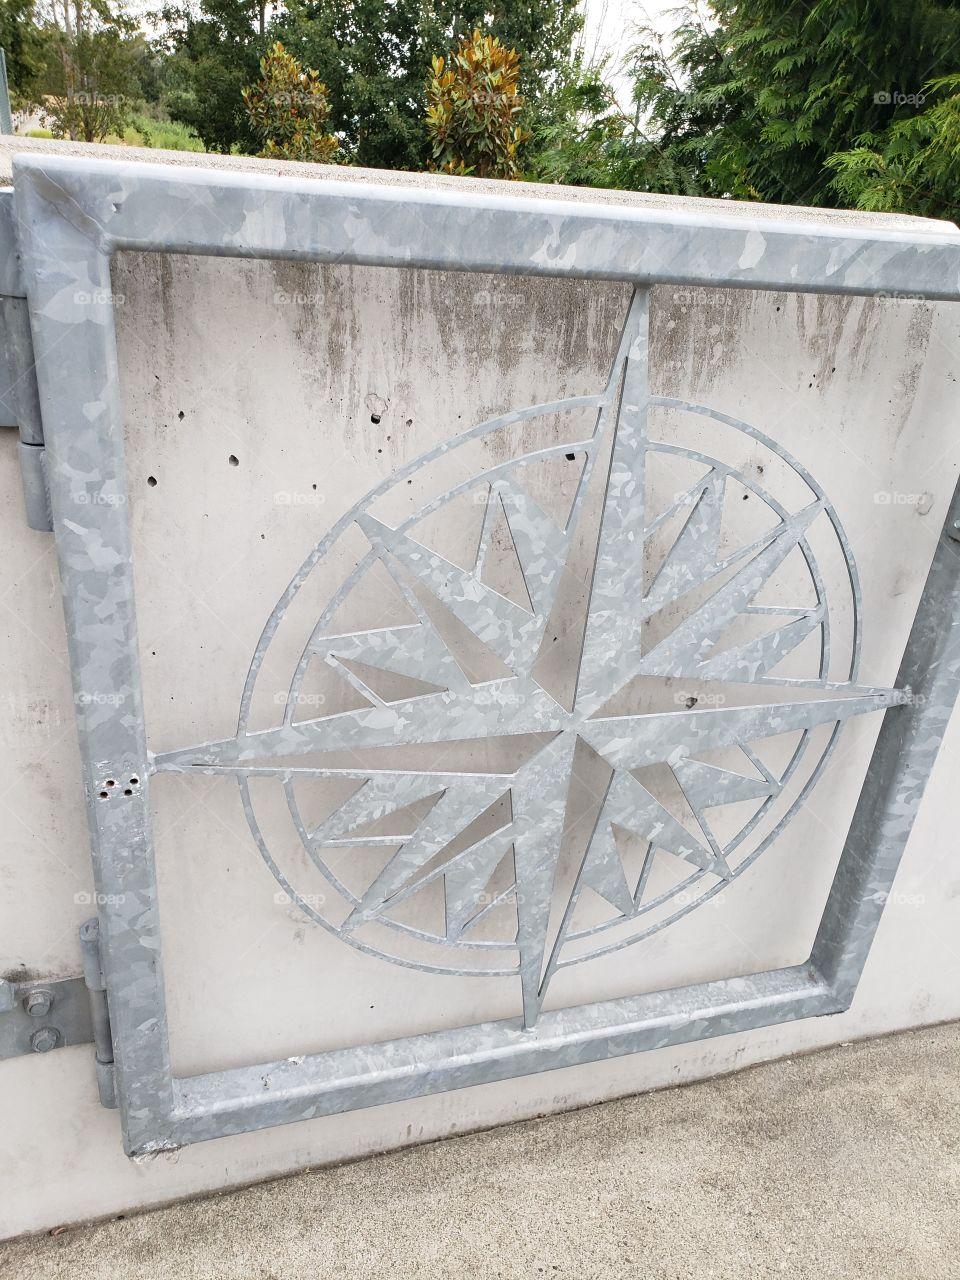 Starburst gate